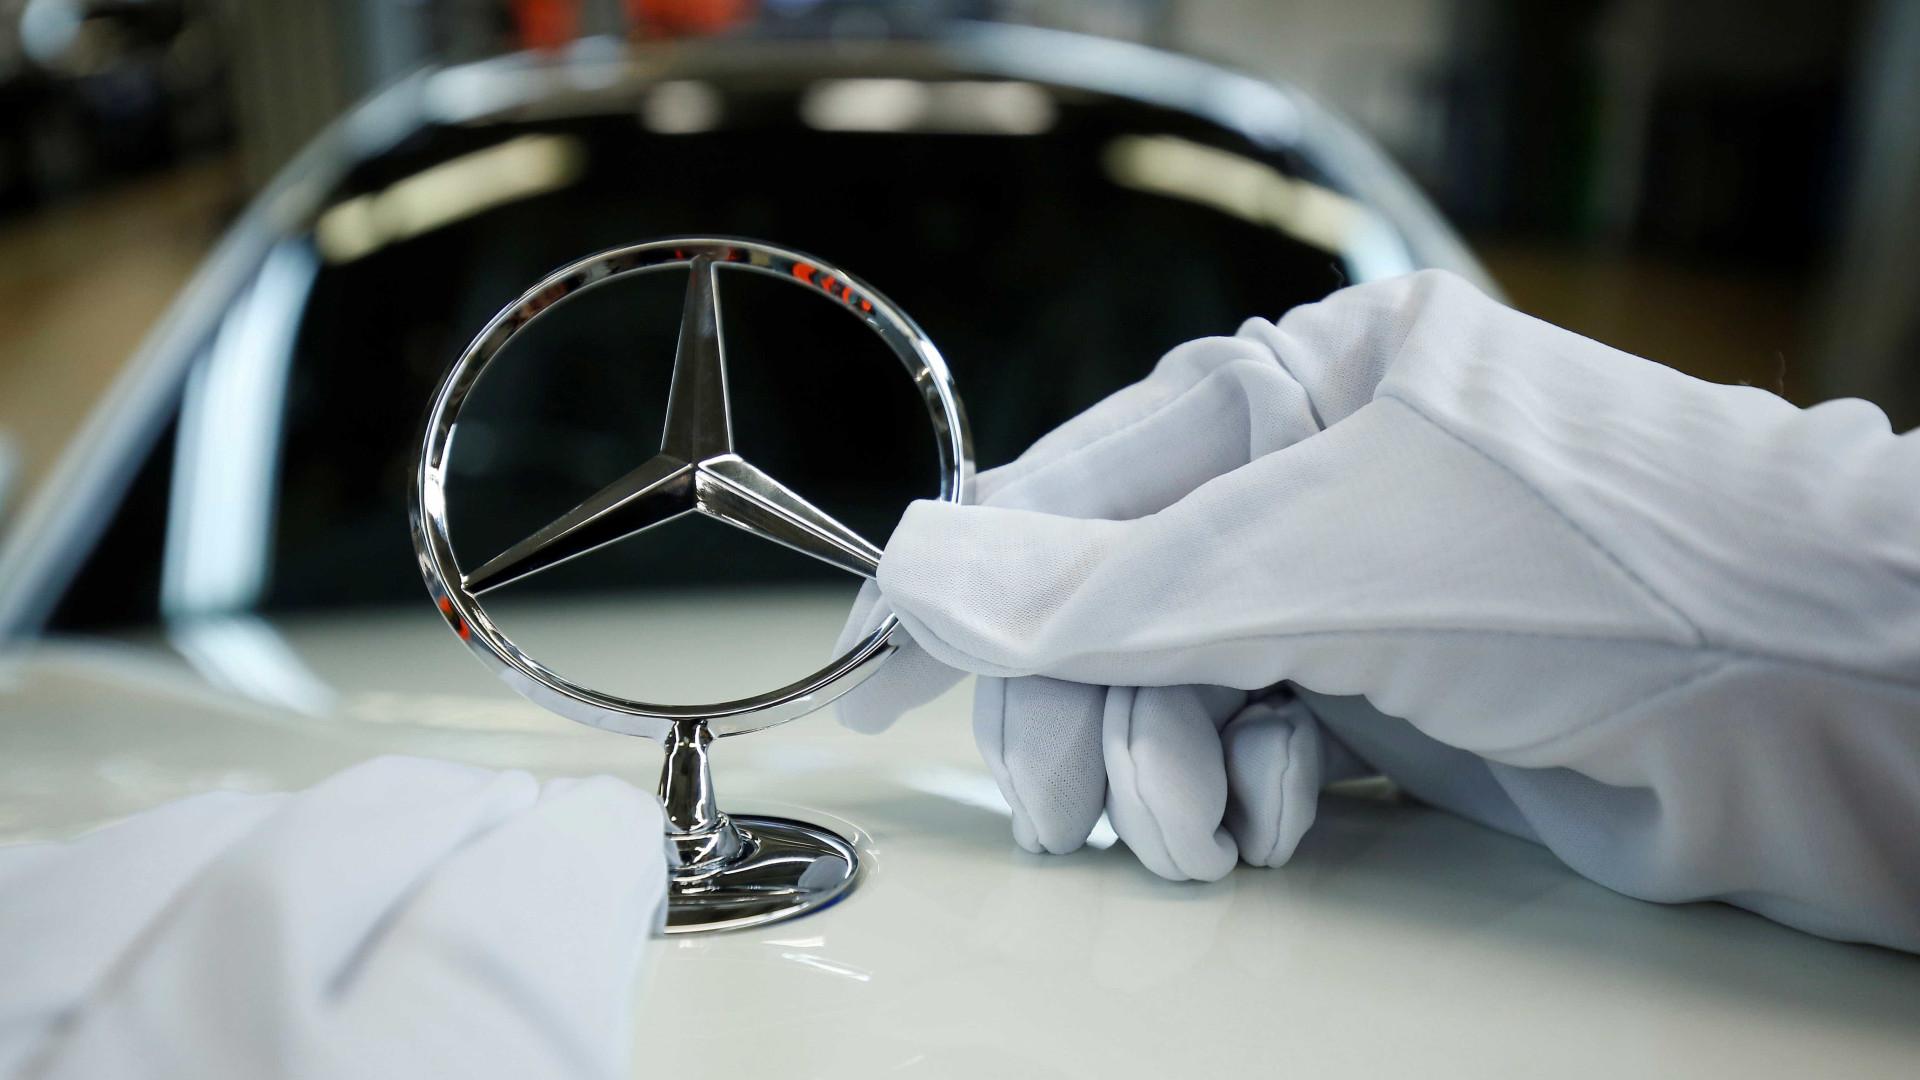 Greve mobiliza 8 mil trabalhadores na Mercedes por reajuste salarial